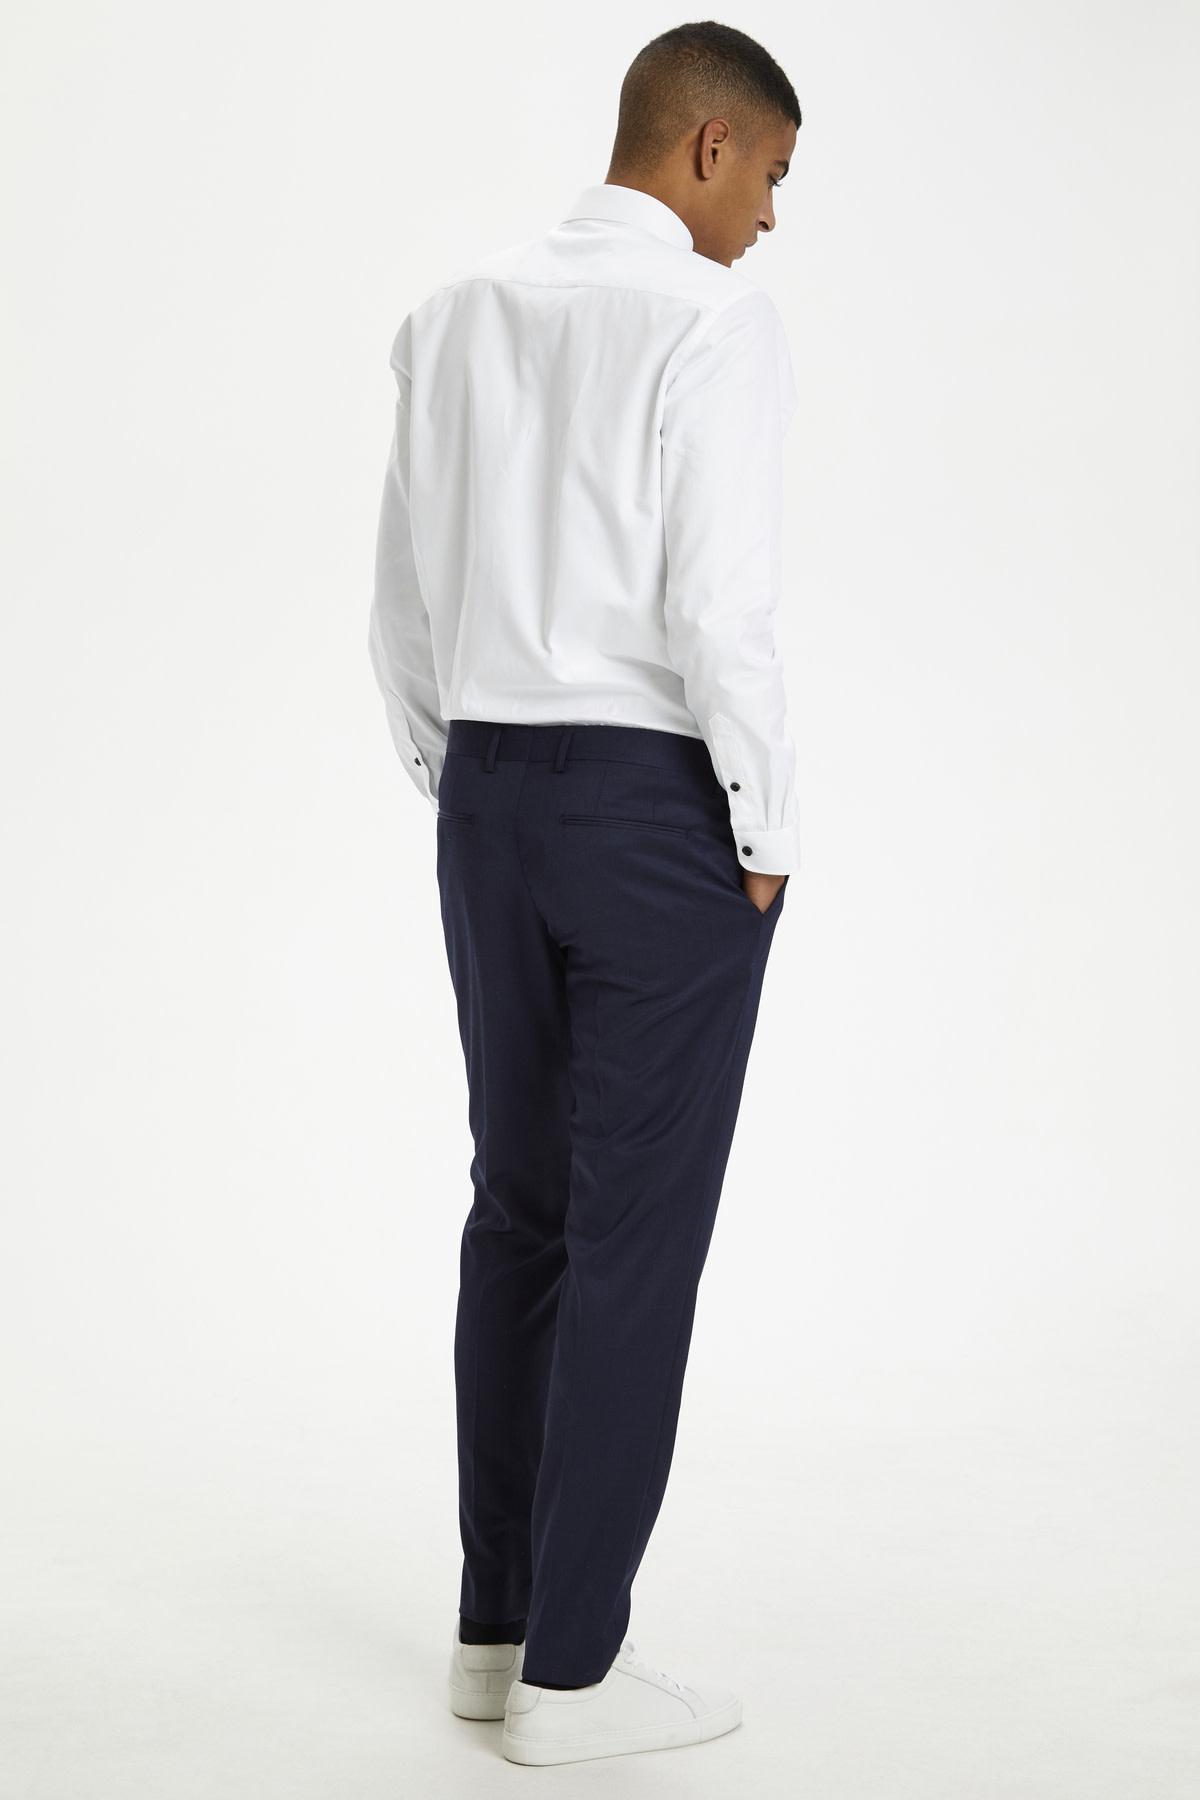 Trostol White Dress Shirt